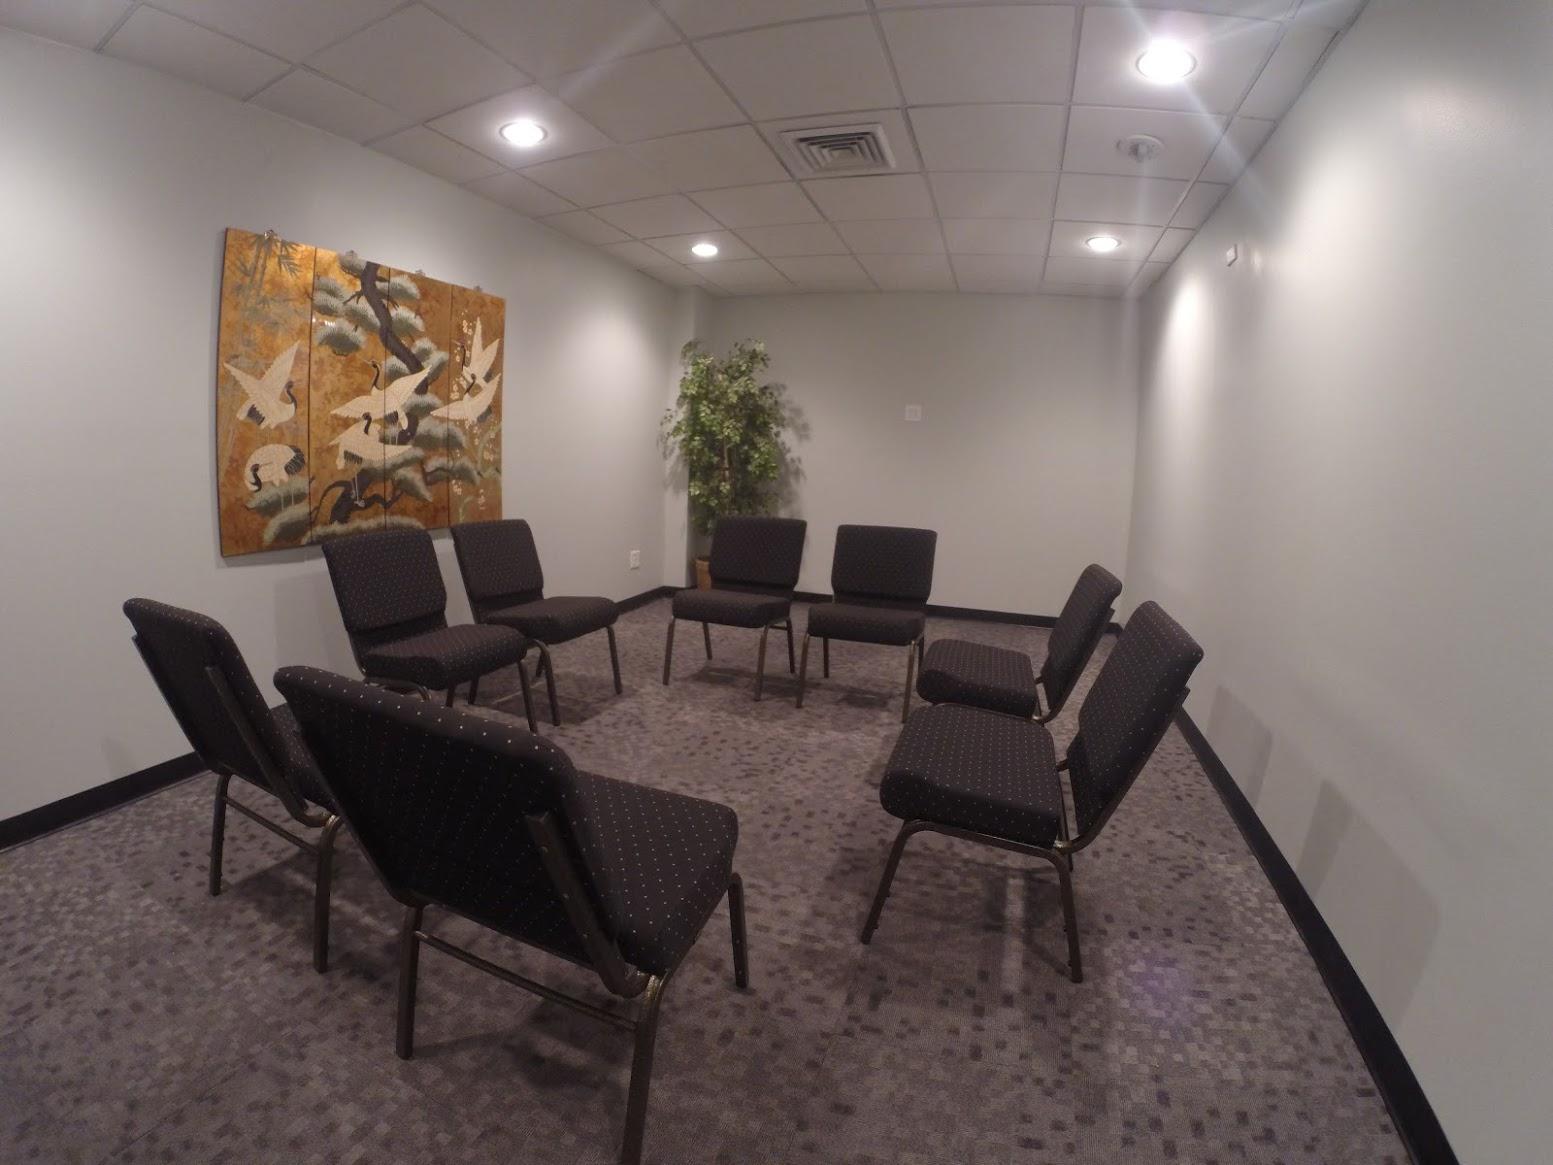 Seminar & group room c.jpg